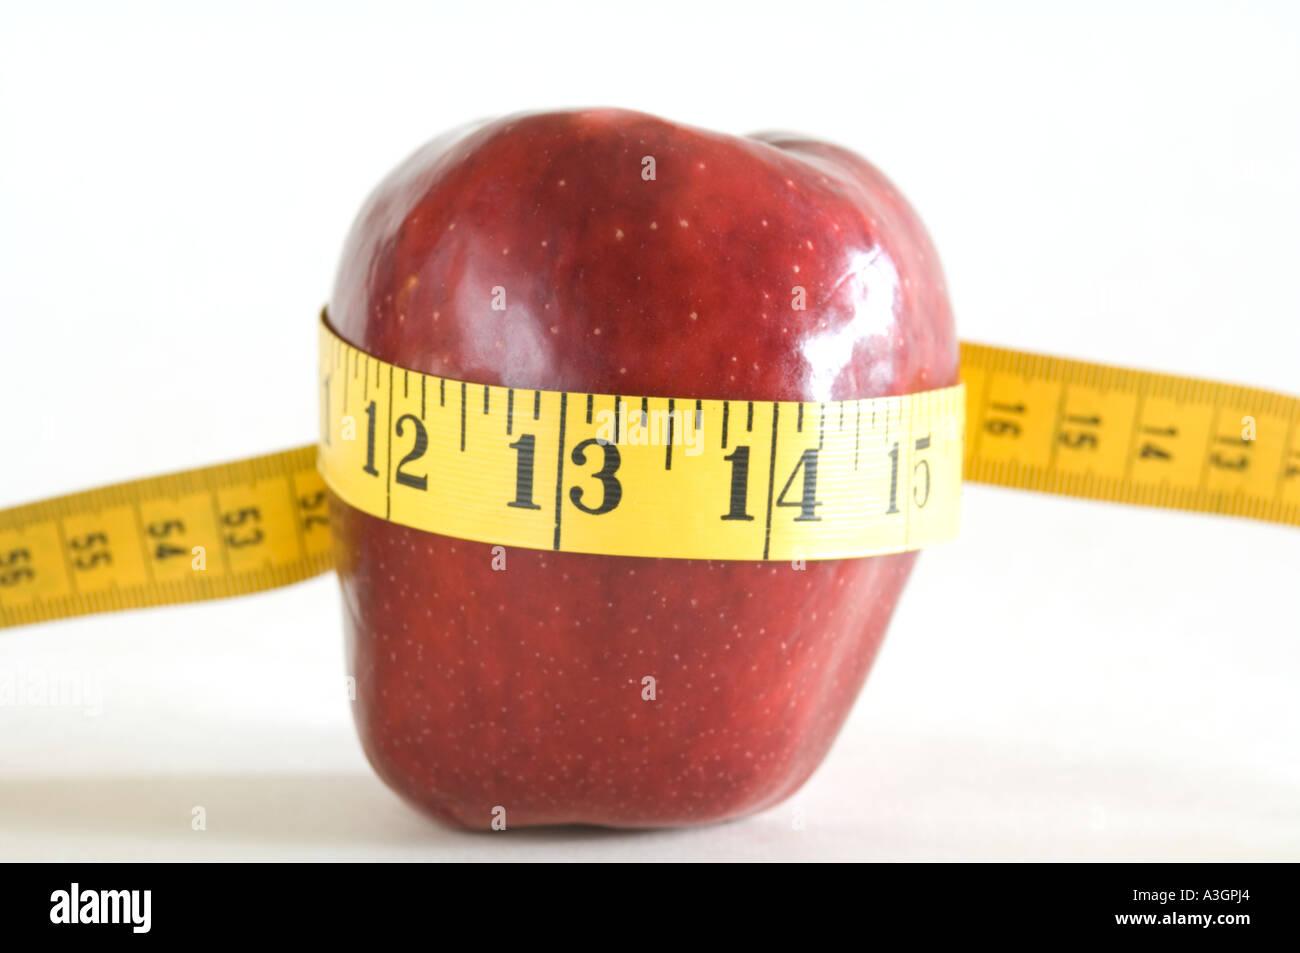 Konzept-Ansicht von rotem Apfel am Maßband Stockbild